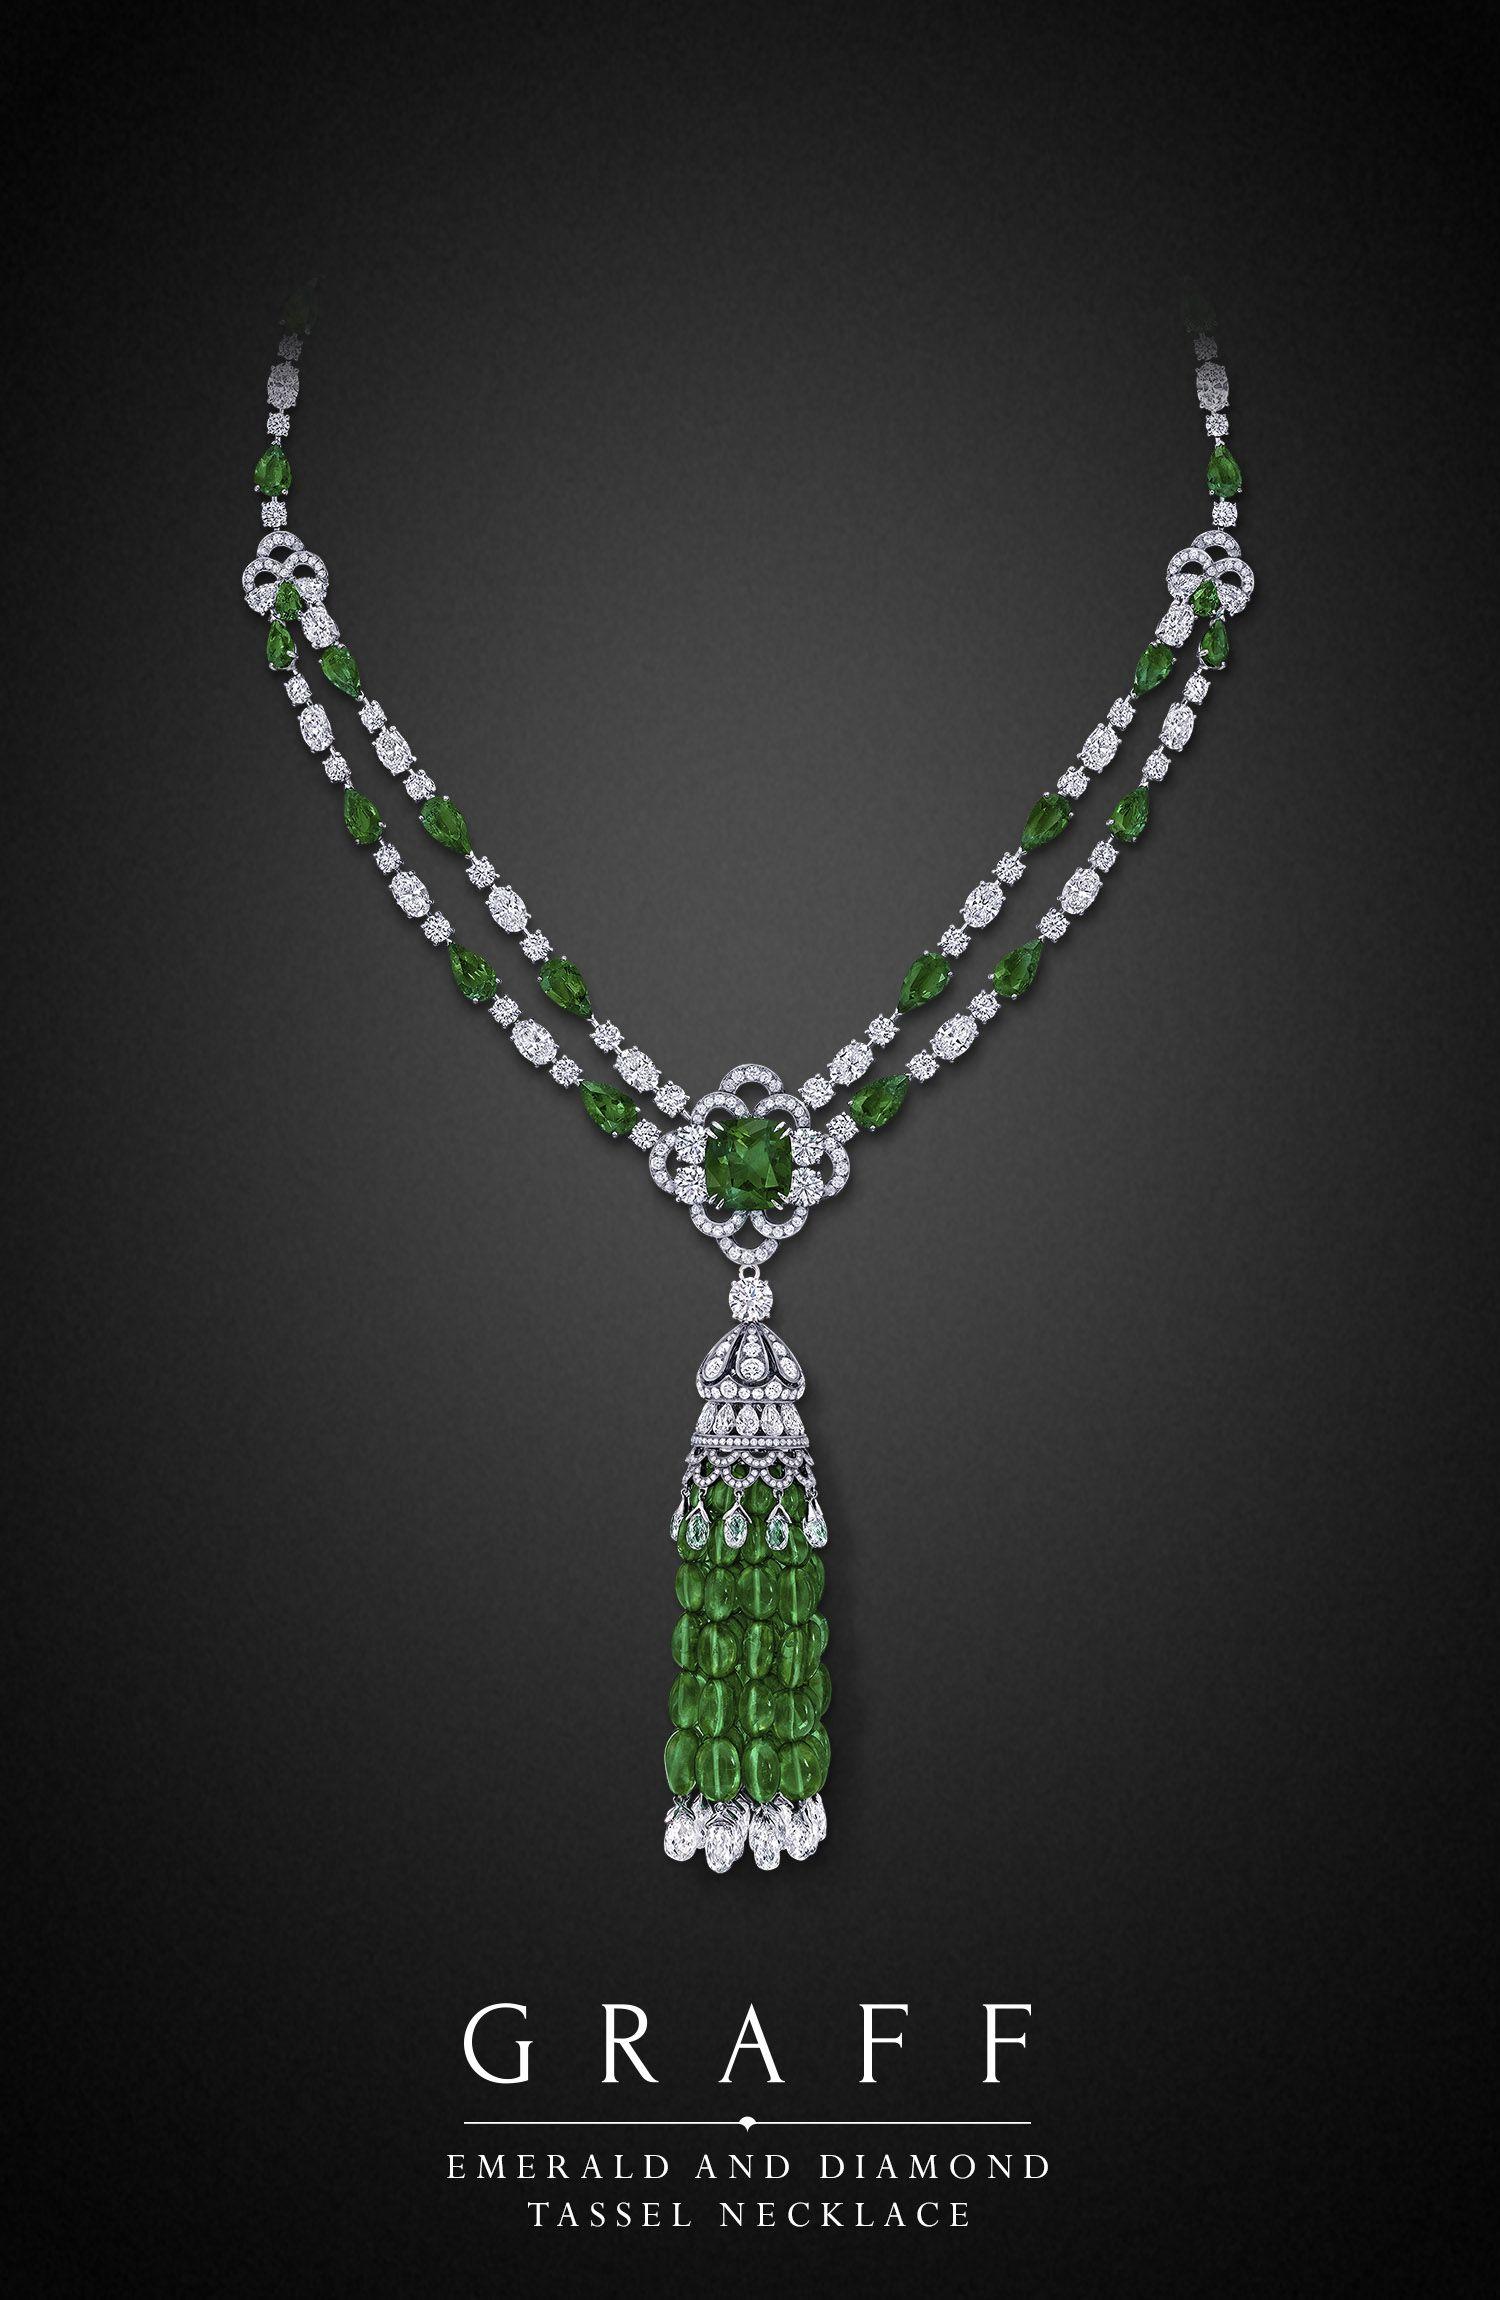 An emerald and diamond tassel necklace, featuring a 10.03-carat cushion cut Colombian emerald (diamonds 59.95 carats, emeralds 152.84 carats).